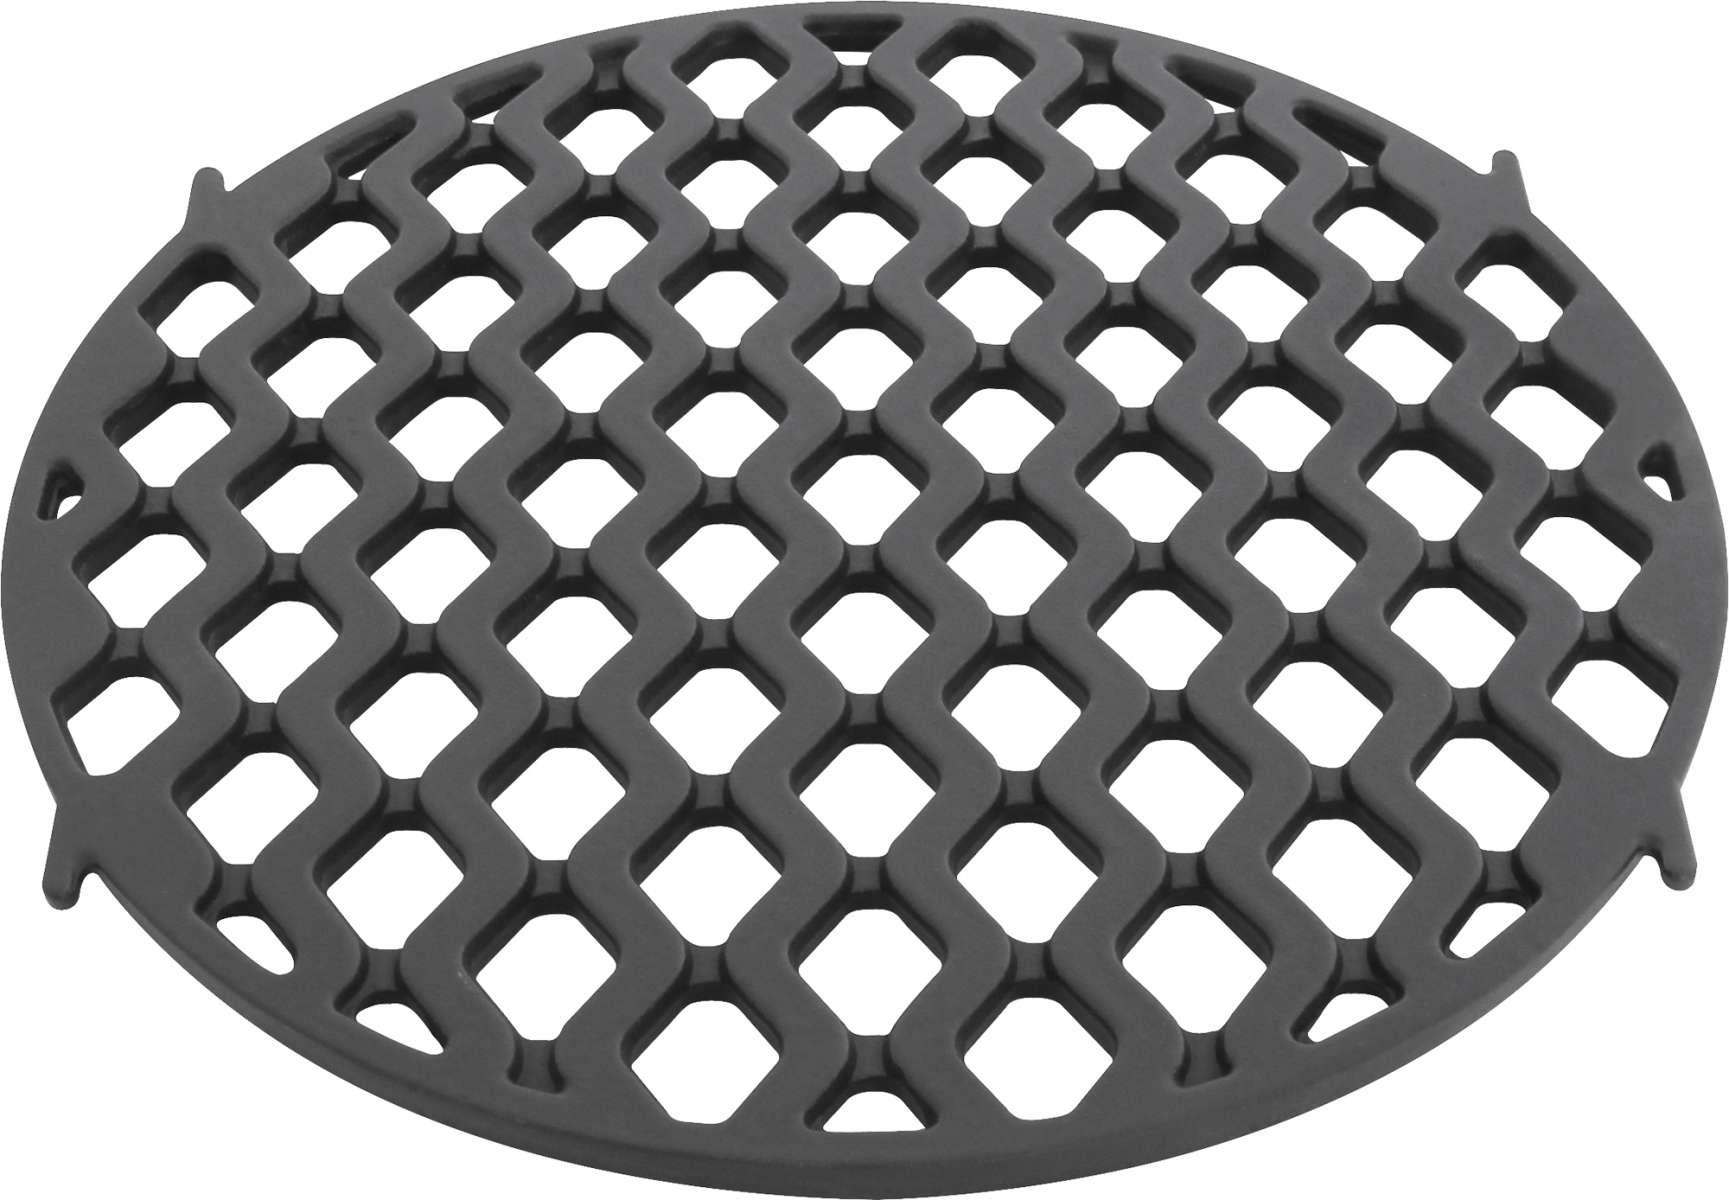 Enders Grillpfanne Switch Grid Sear Grate | 04000591077913